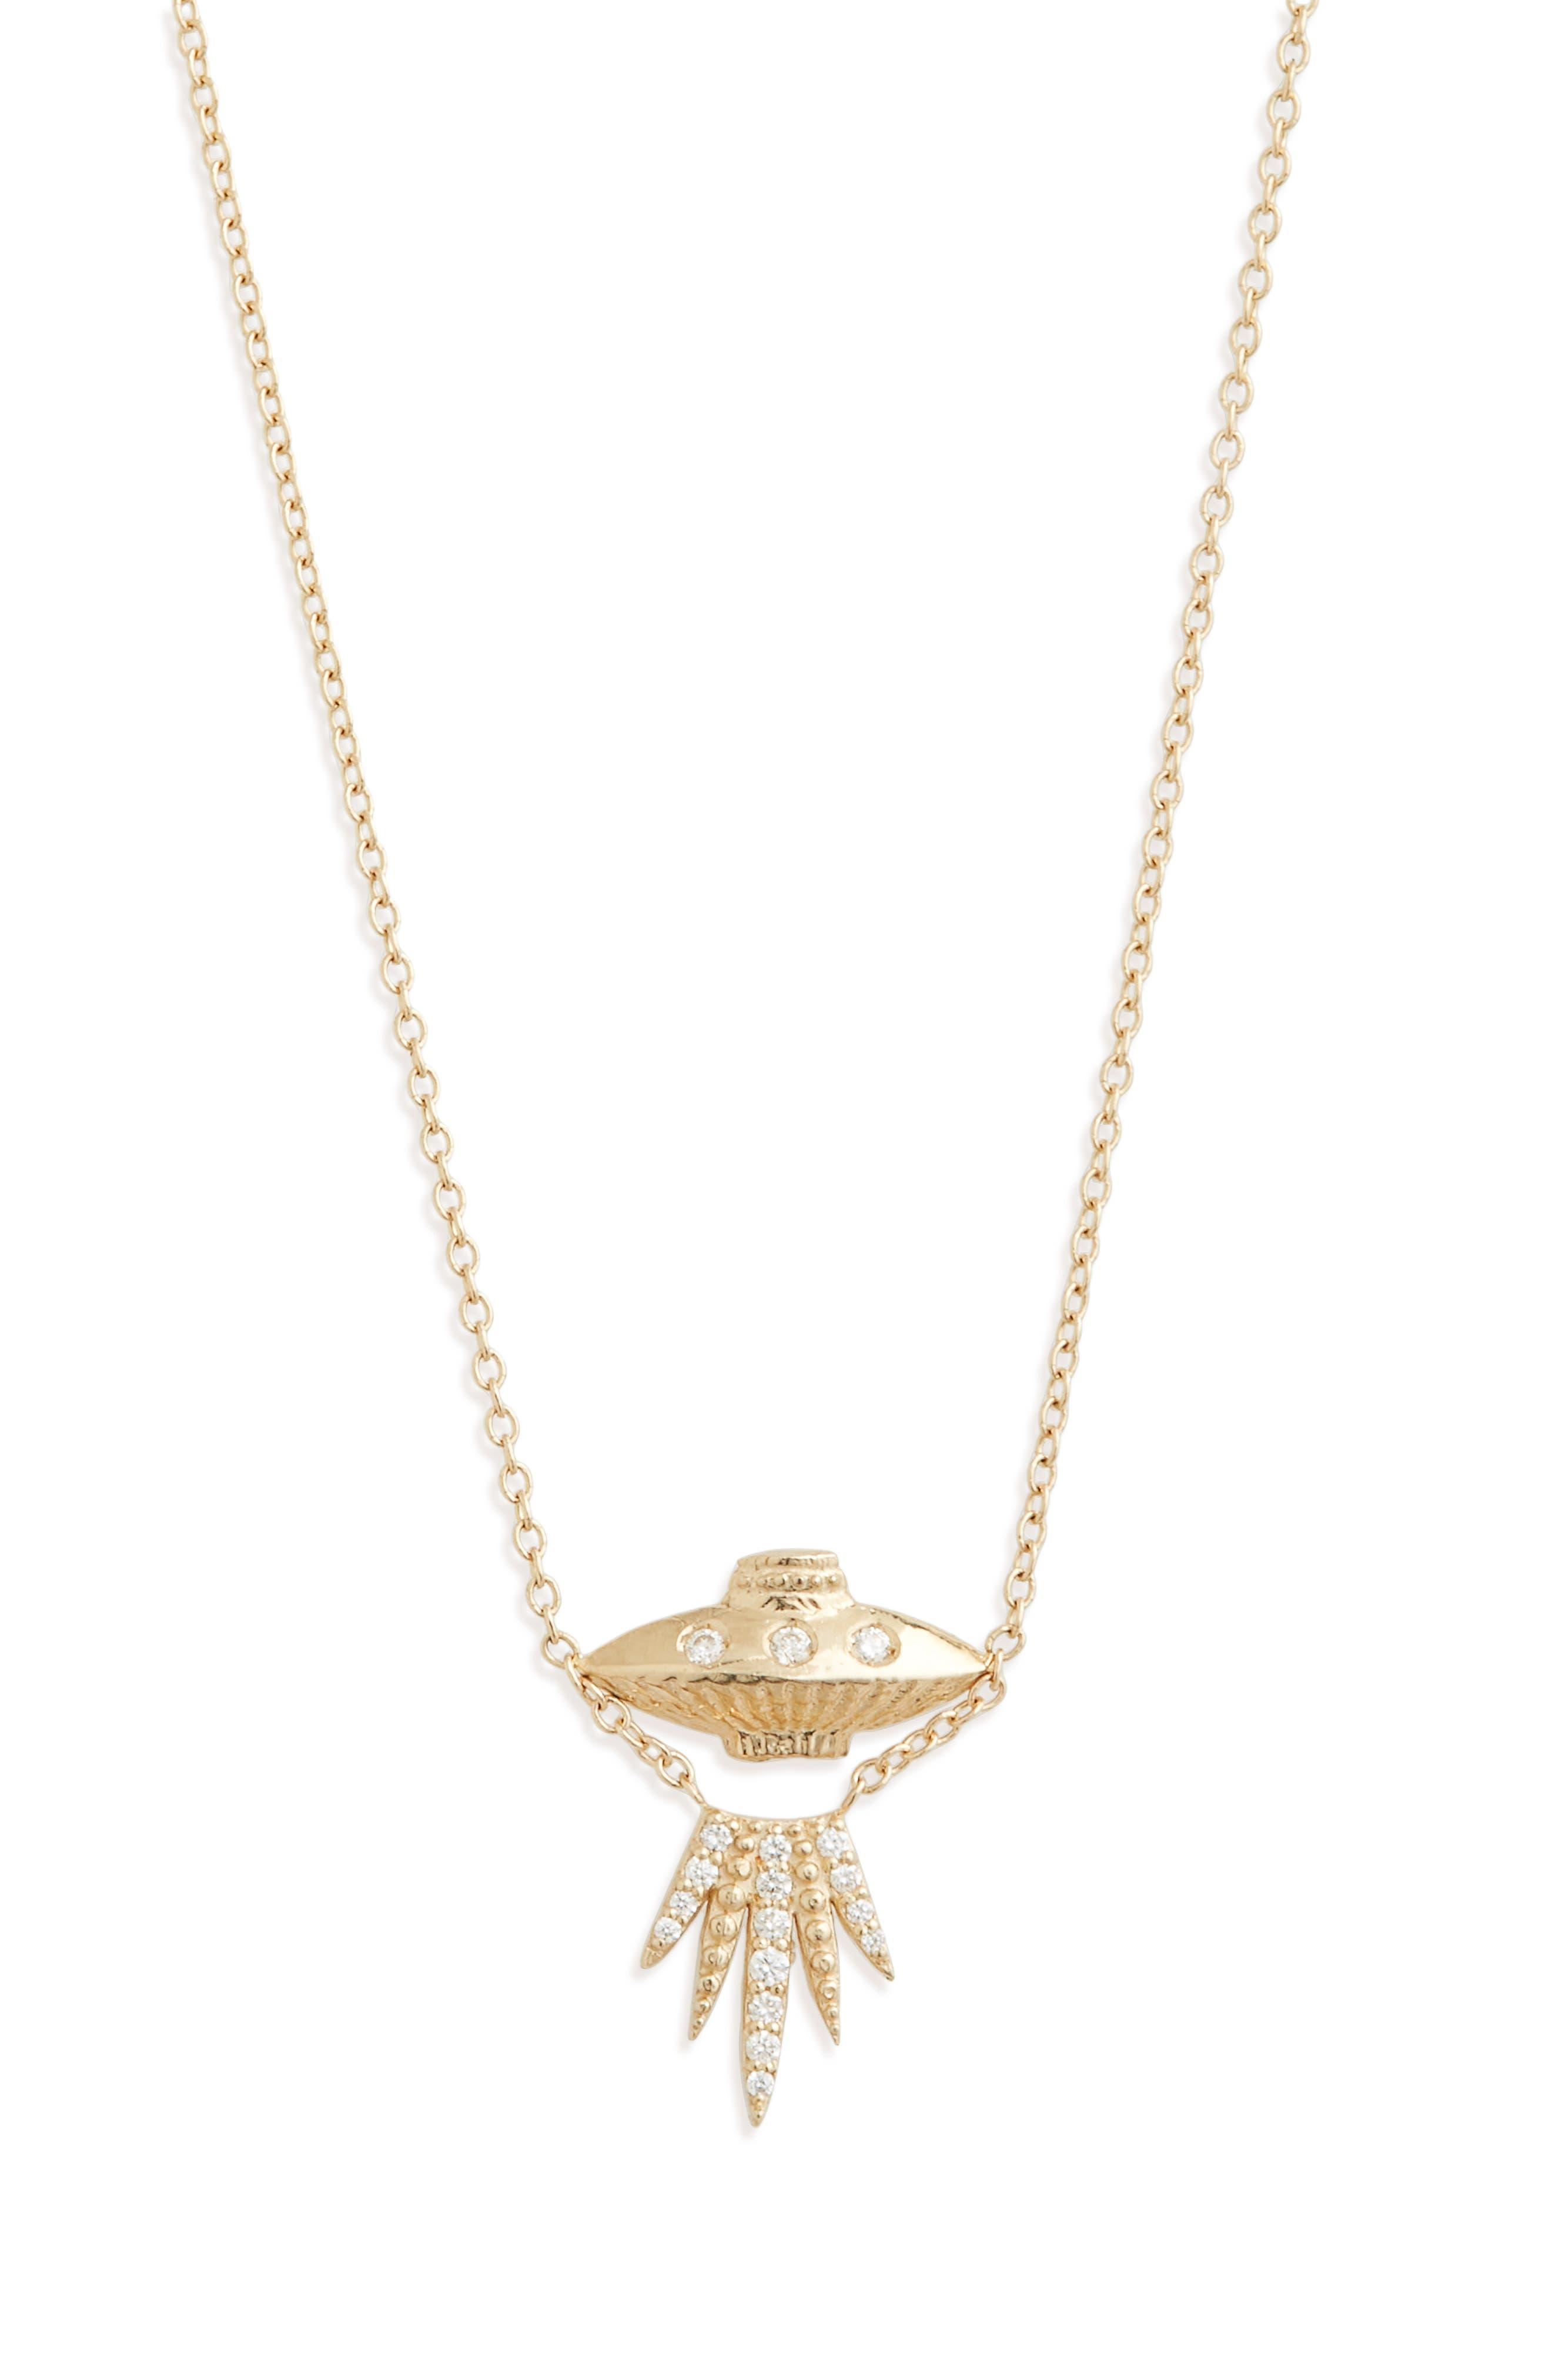 Sofia Zakia Tender Abduction UFO Diamond Necklace